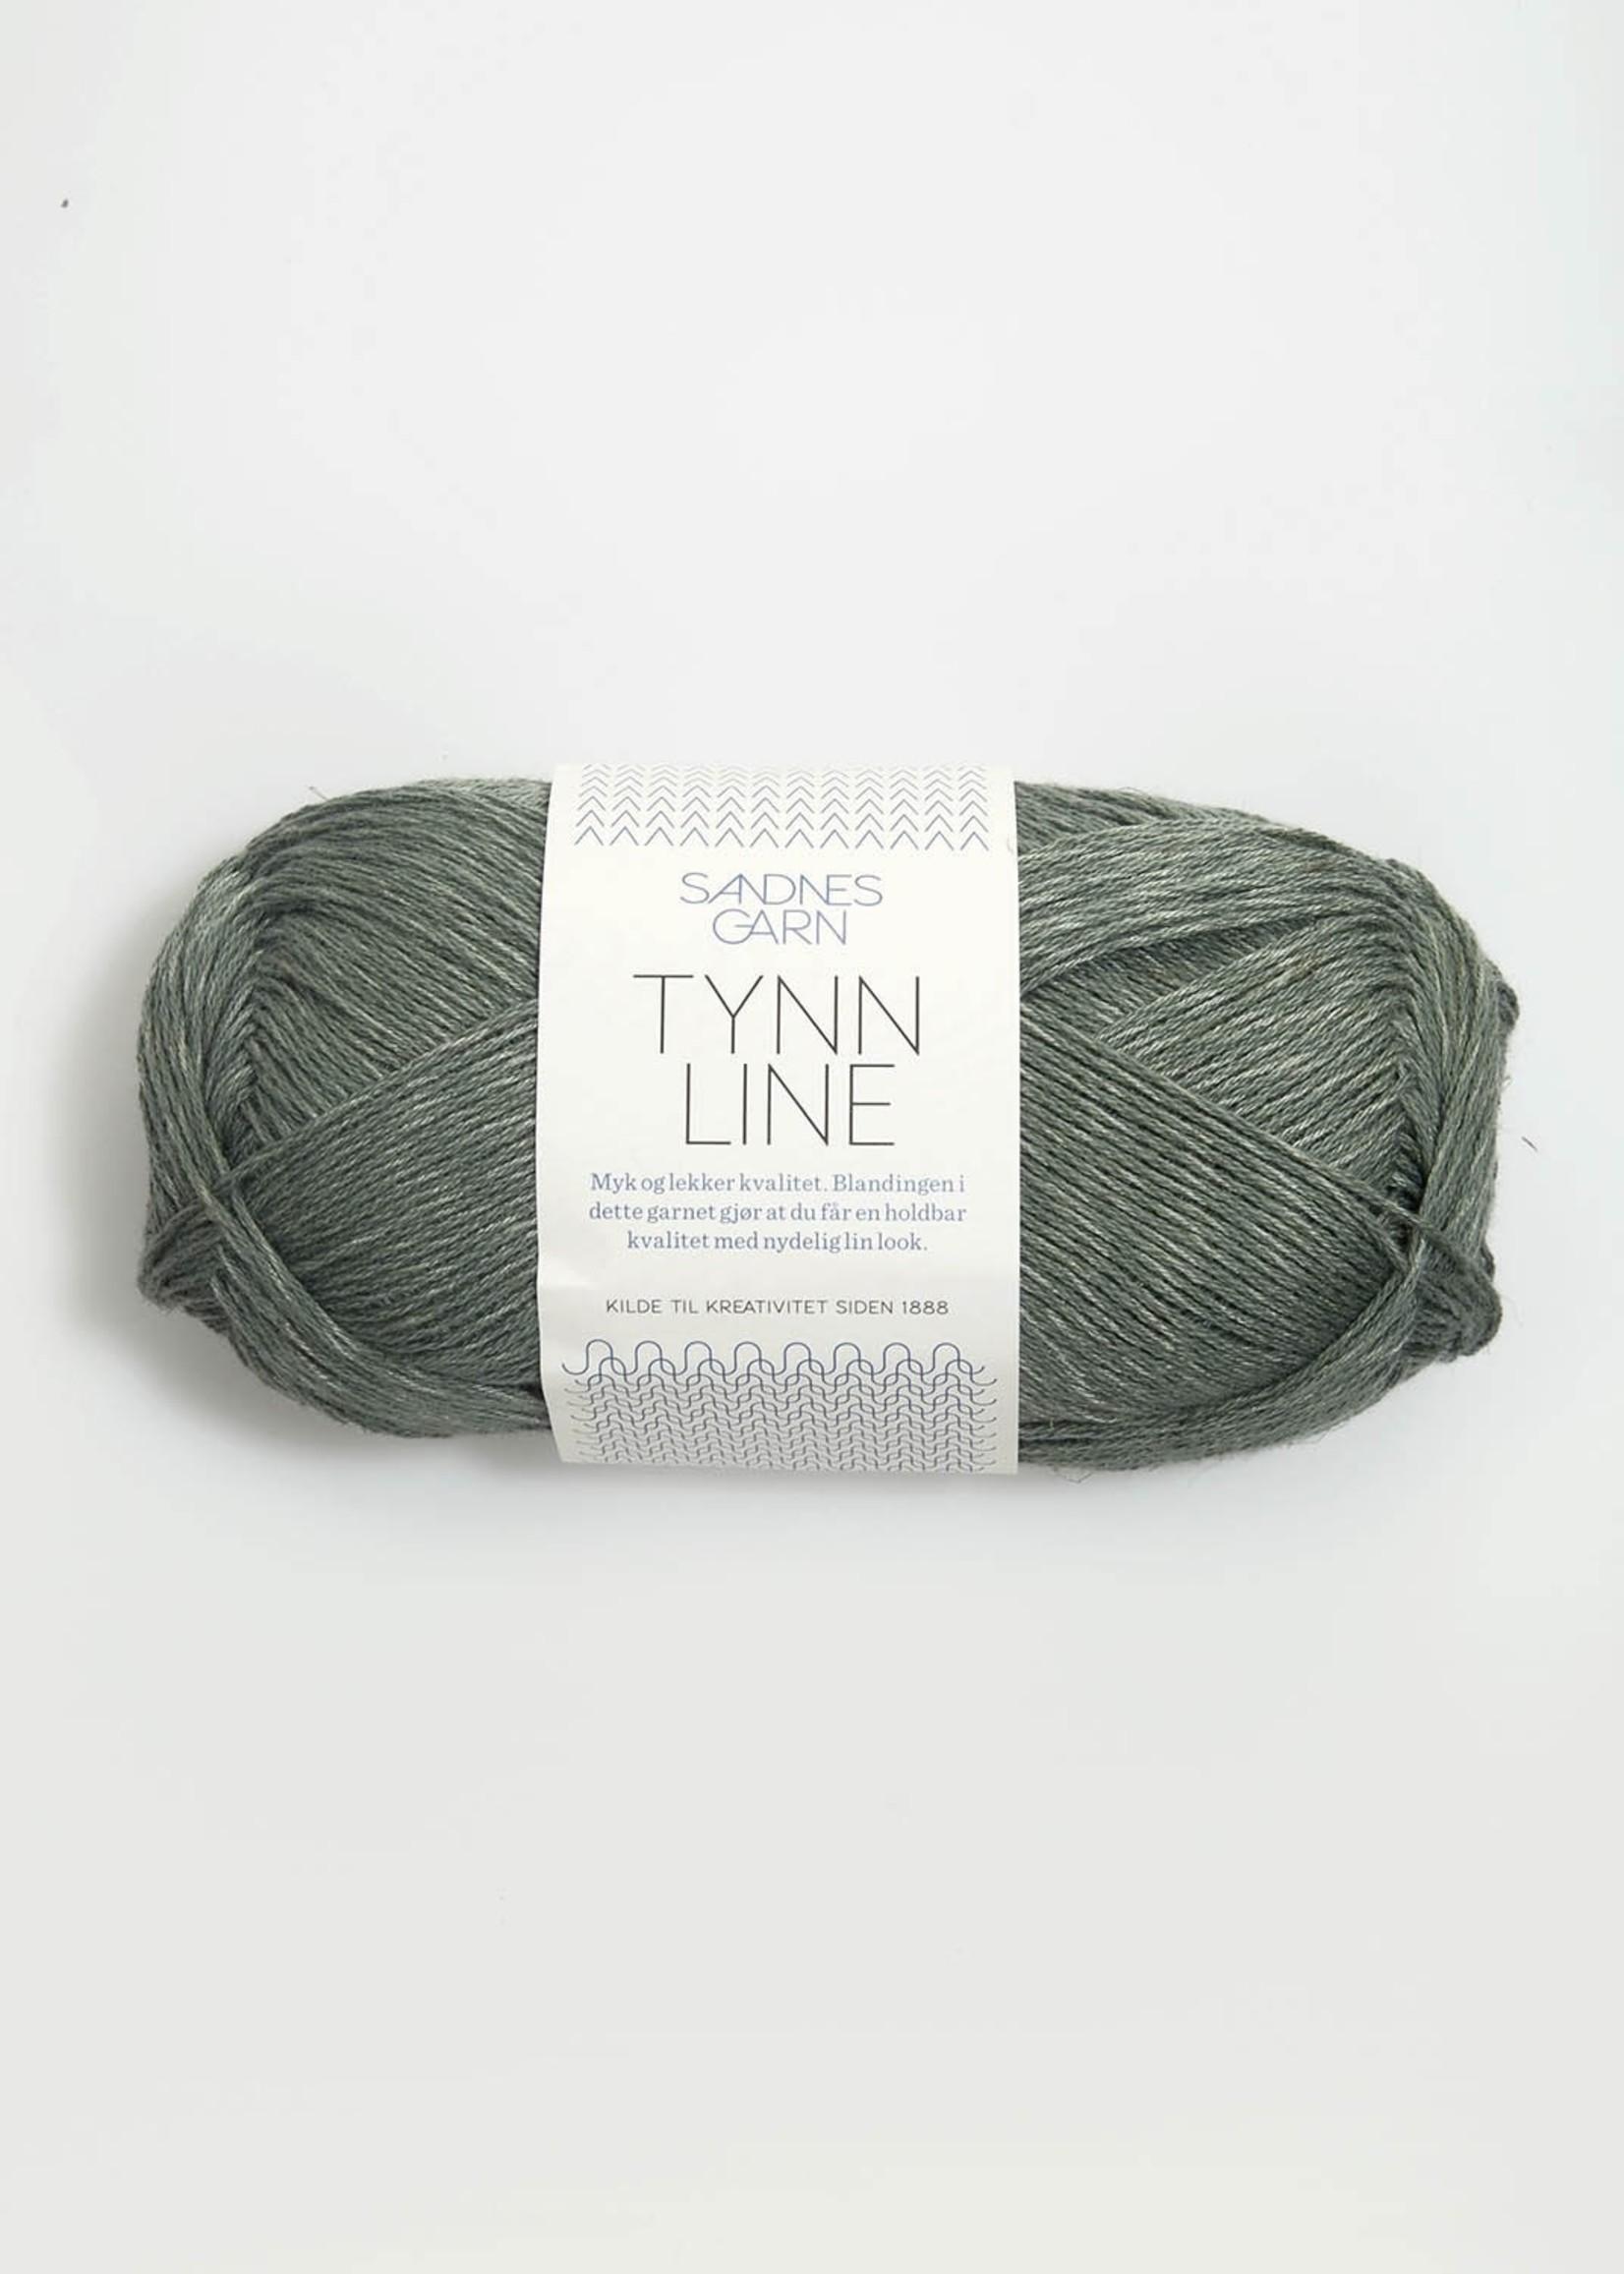 Sandnes Garn Tynn Line - #8561